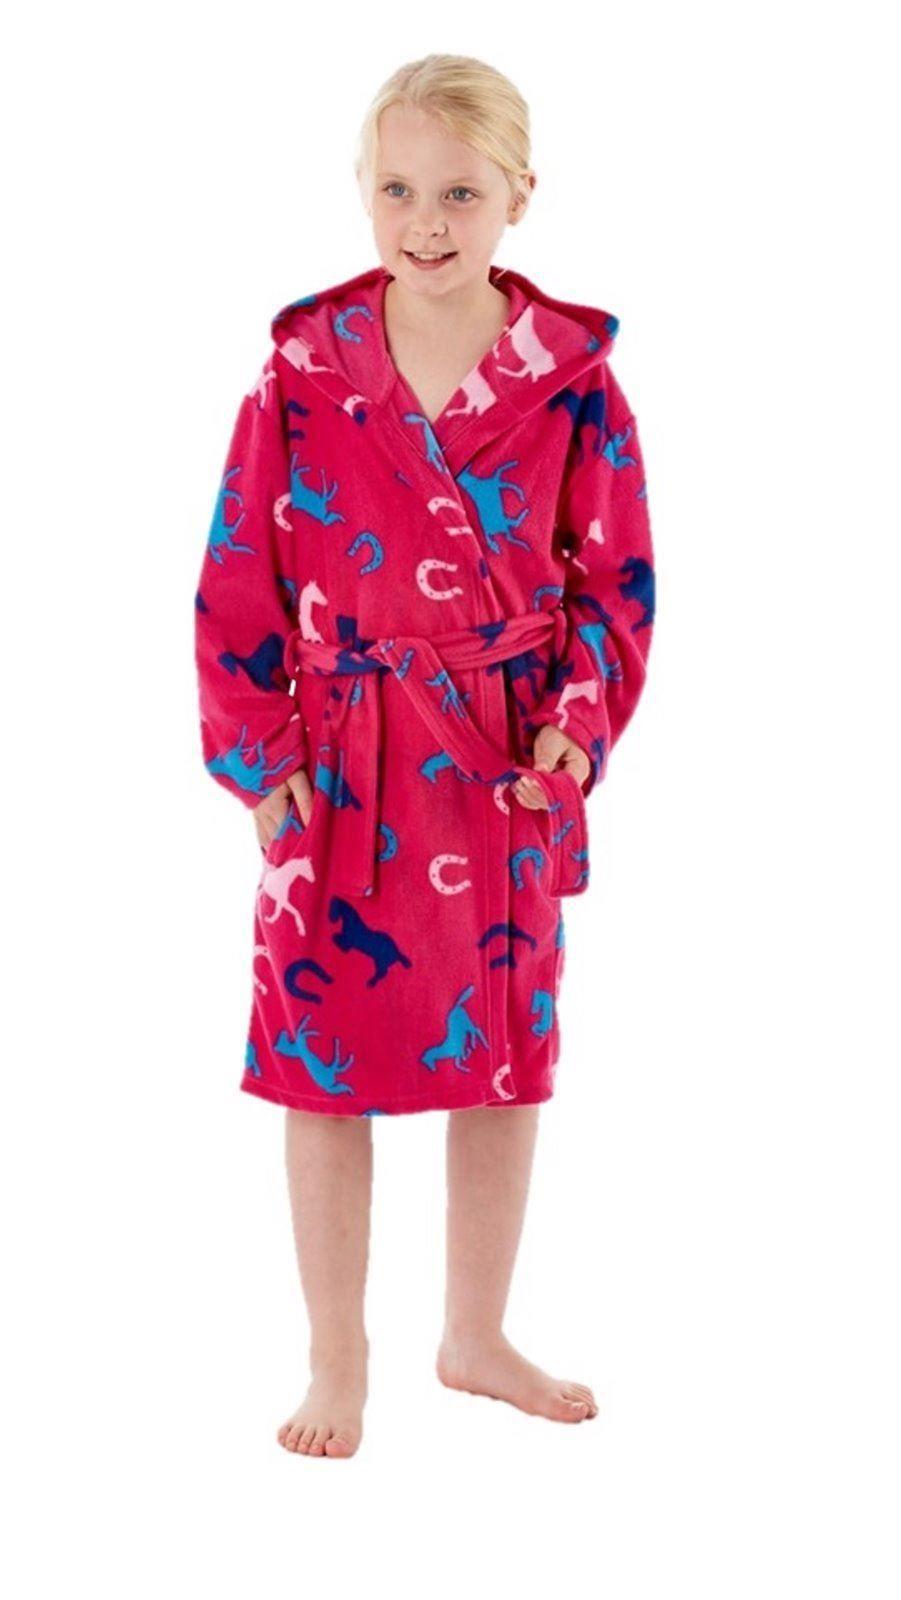 b5678945bc Horse Bath Robes Related Keywords   Suggestions - Horse Bath Robes ...